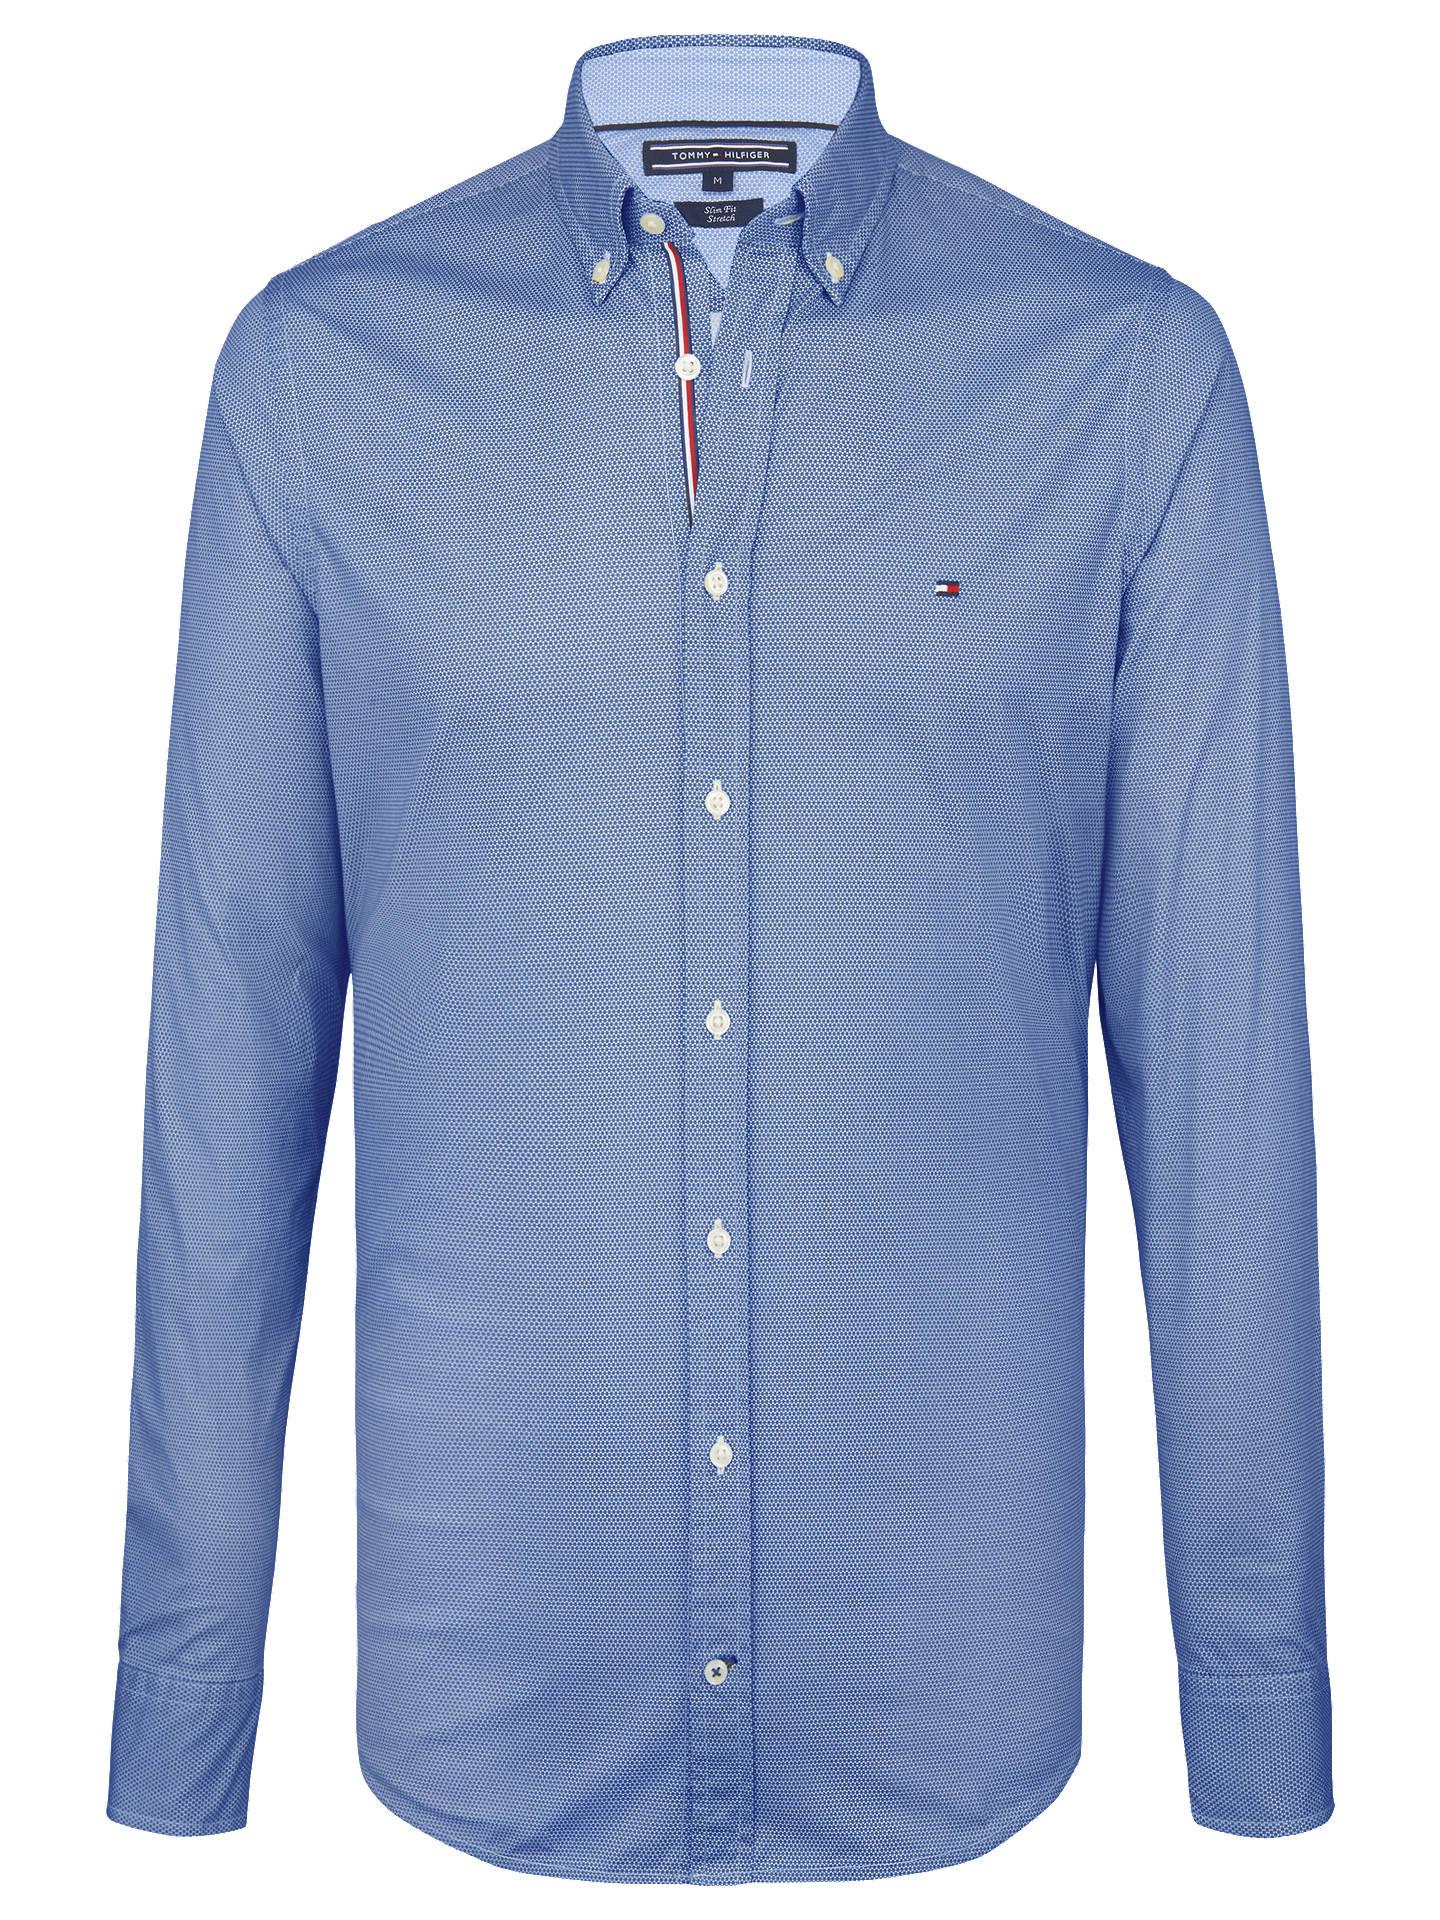 BuyTommy Hilfiger Hexagon Slim Fit Shirt 66ed94c22